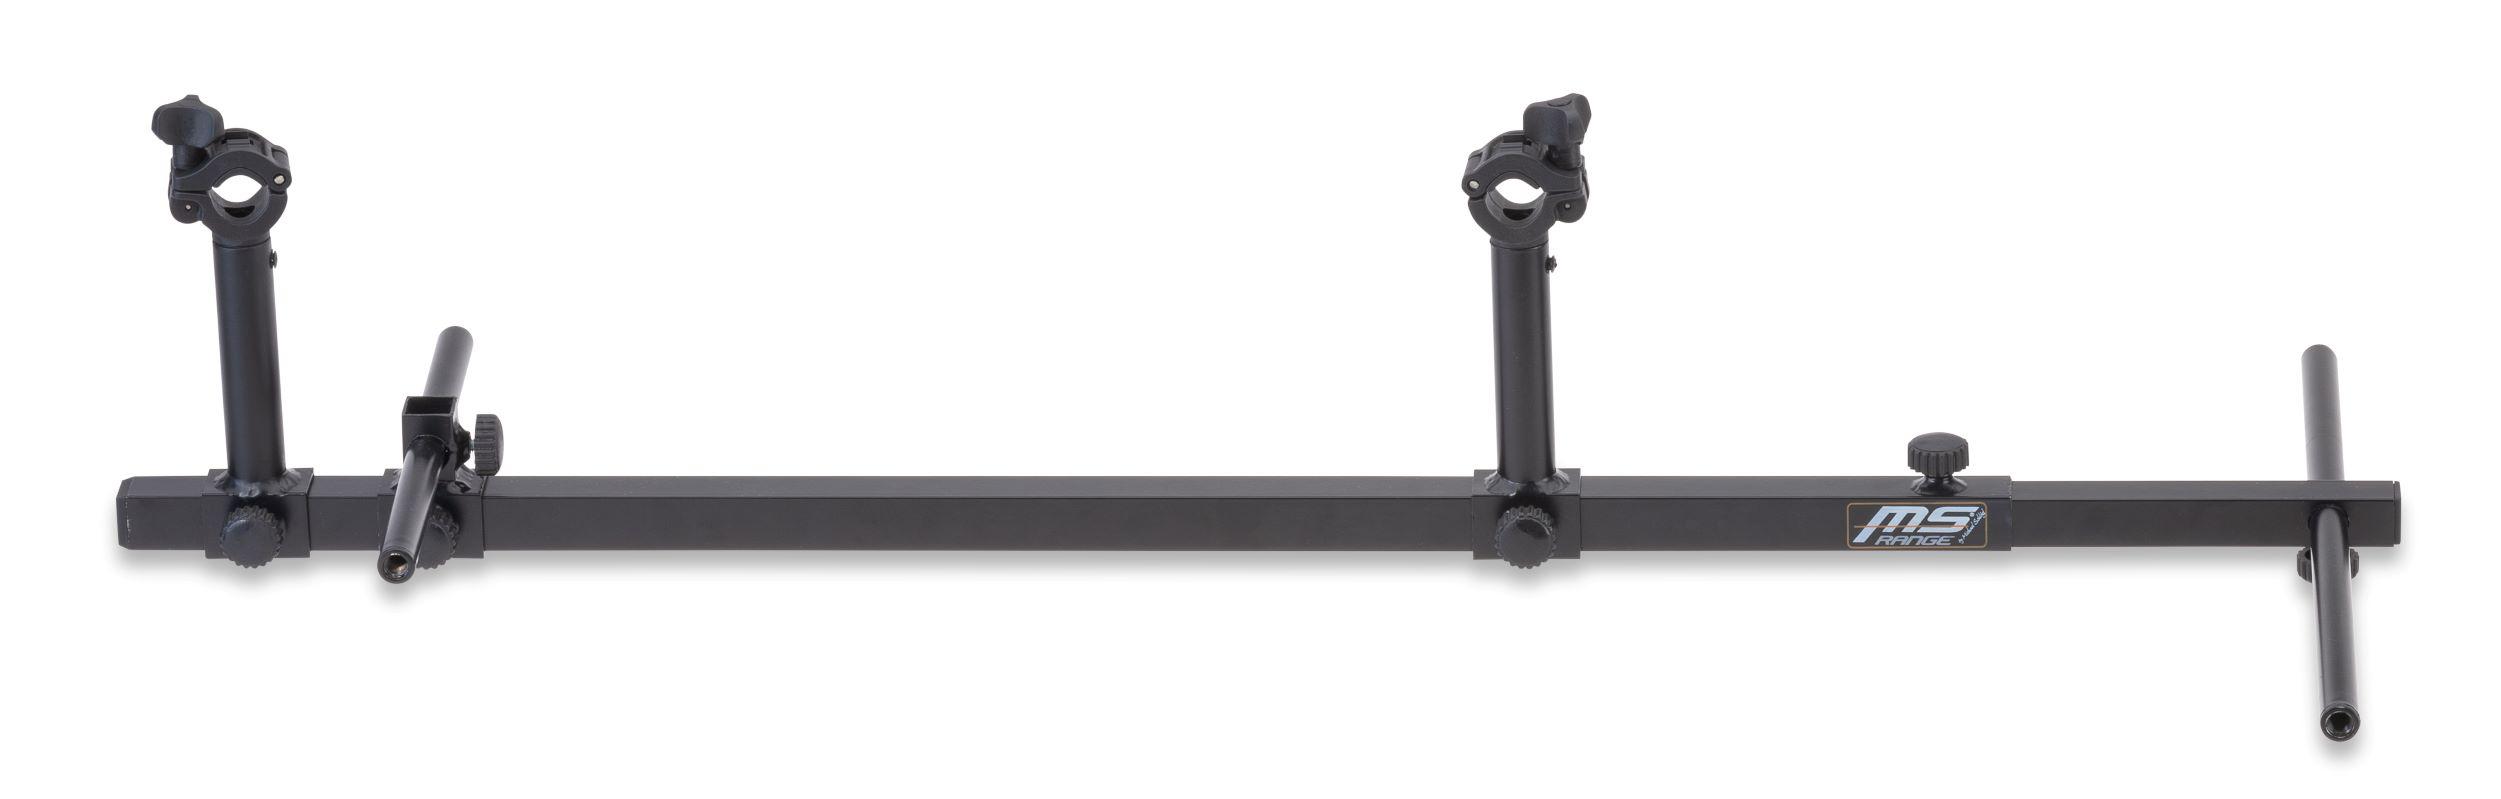 MS Range feederové rameno Universal